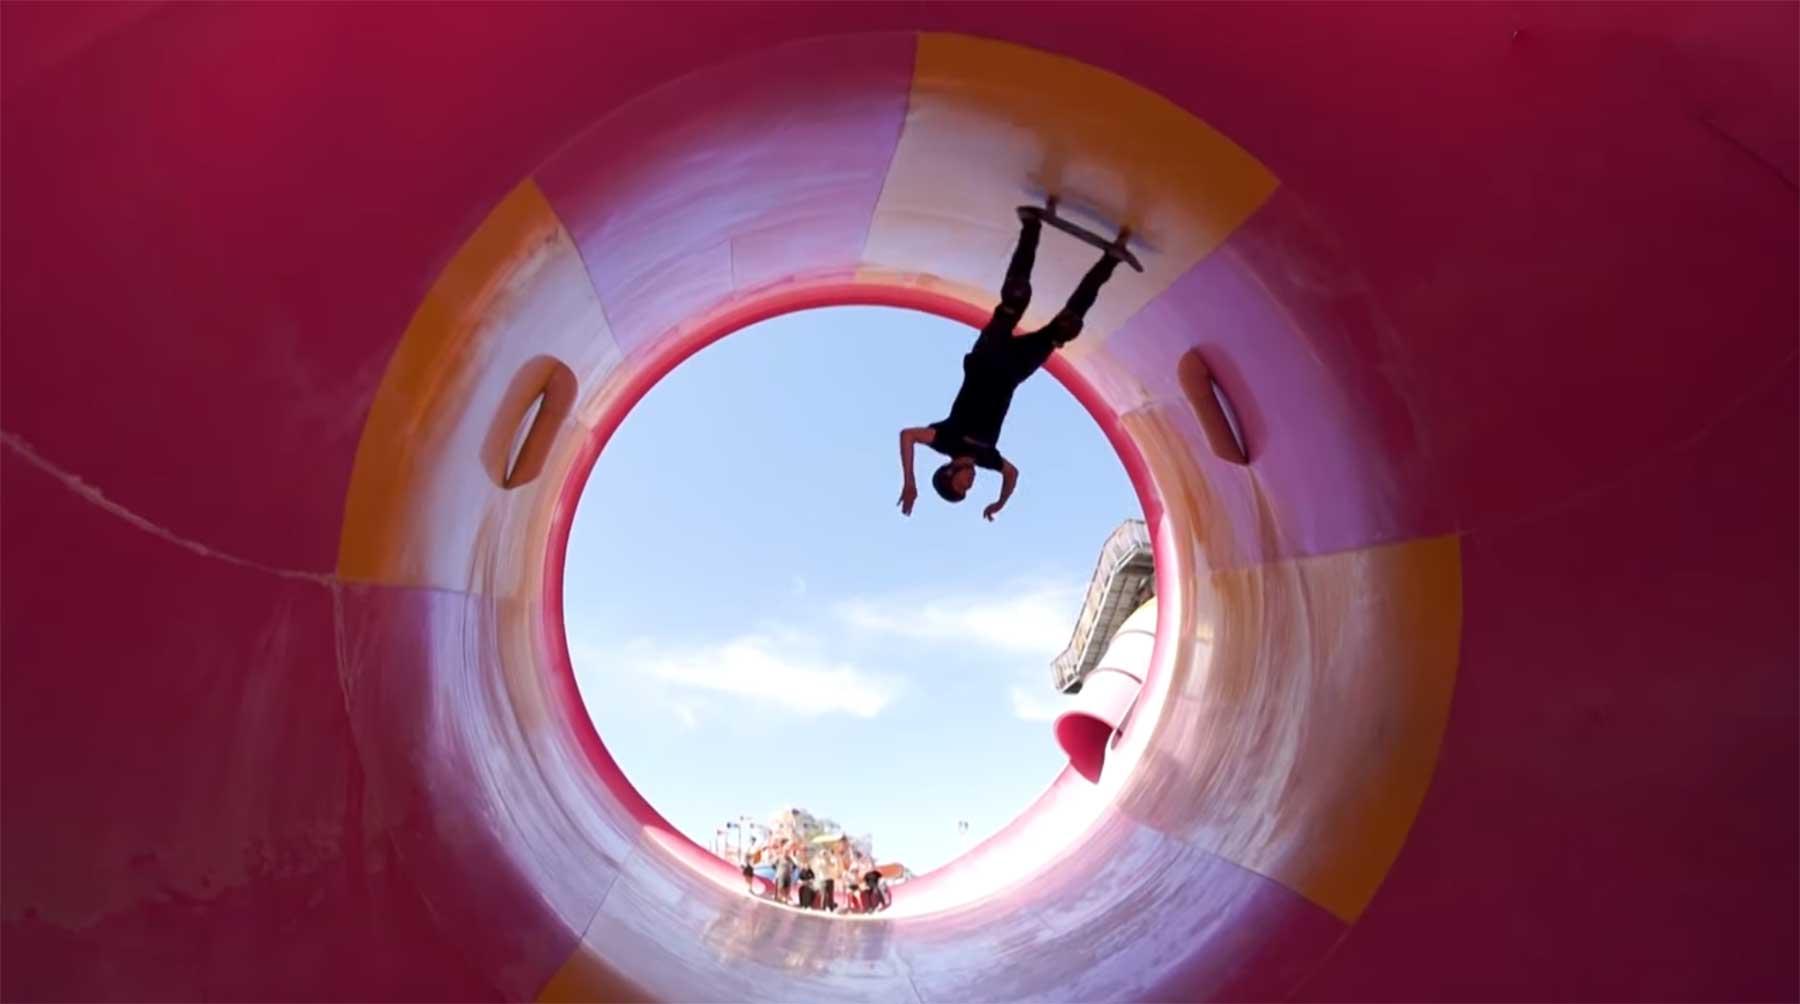 Tony Hawk und Co. skateboarden in verlassenem Wasserpark skateboarden-im-verlassenen-wasserpark-tony-hawk